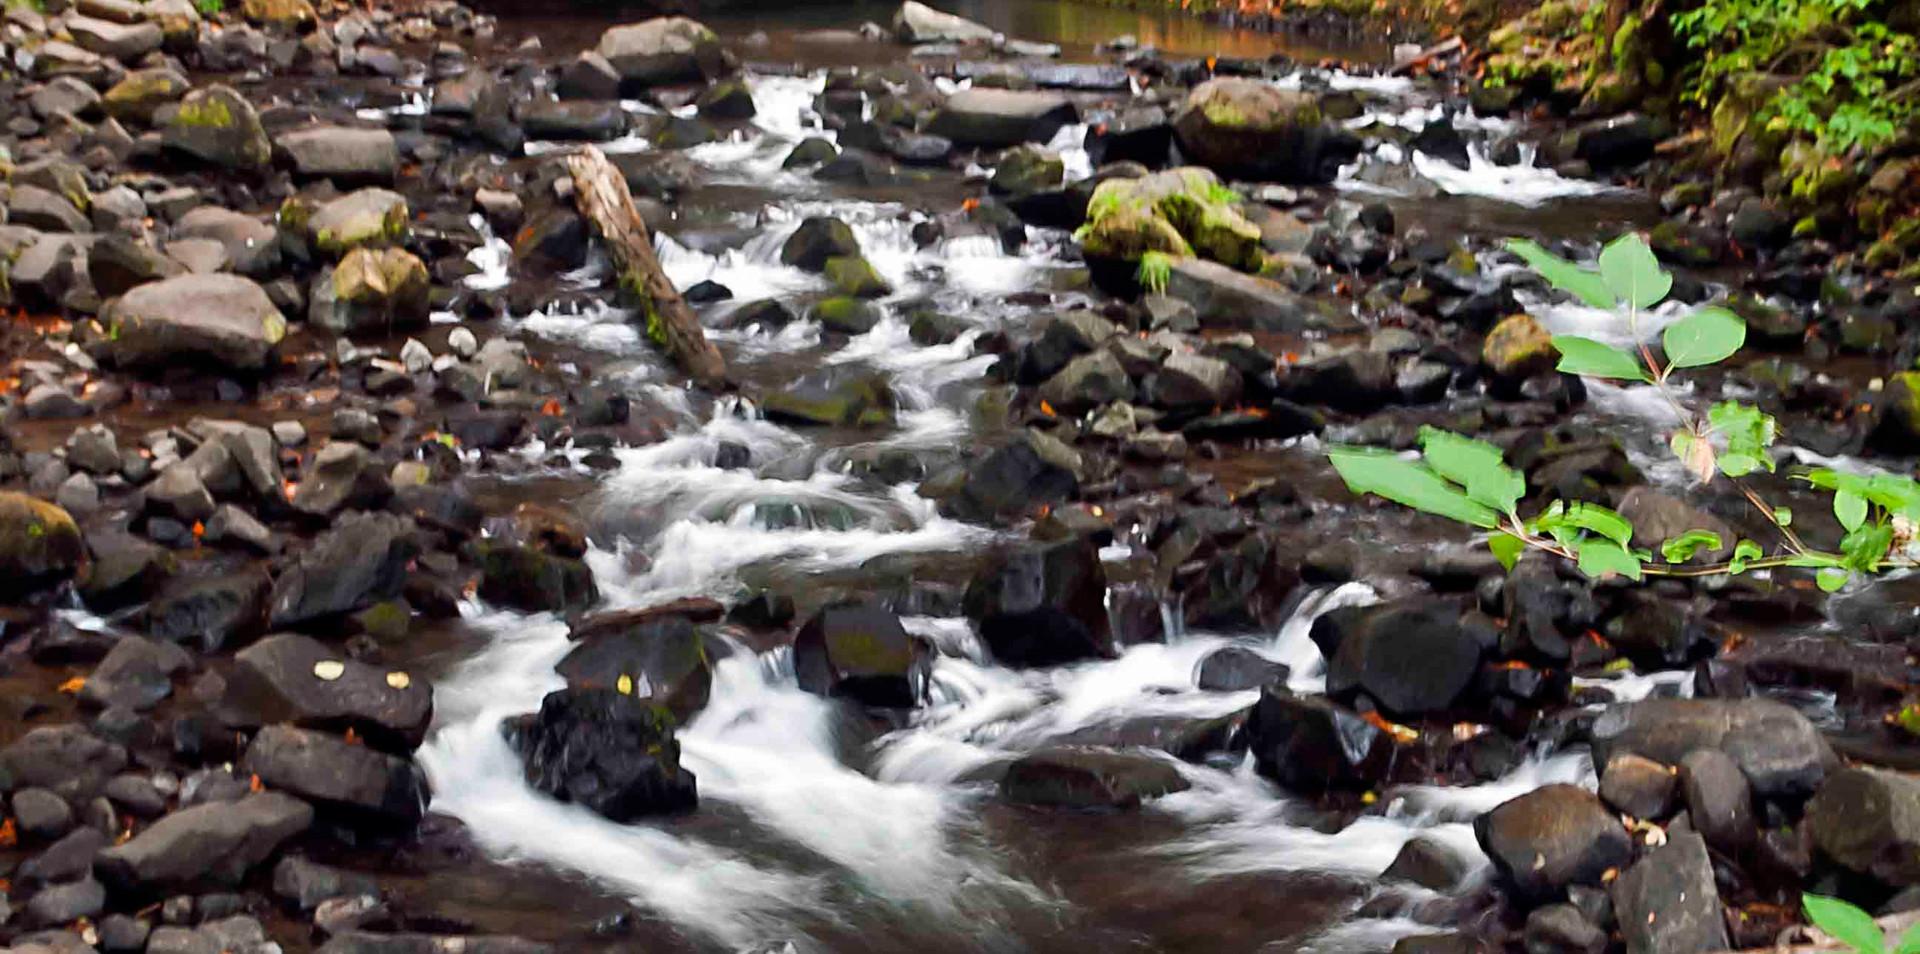 Near Bridal Veil Falls